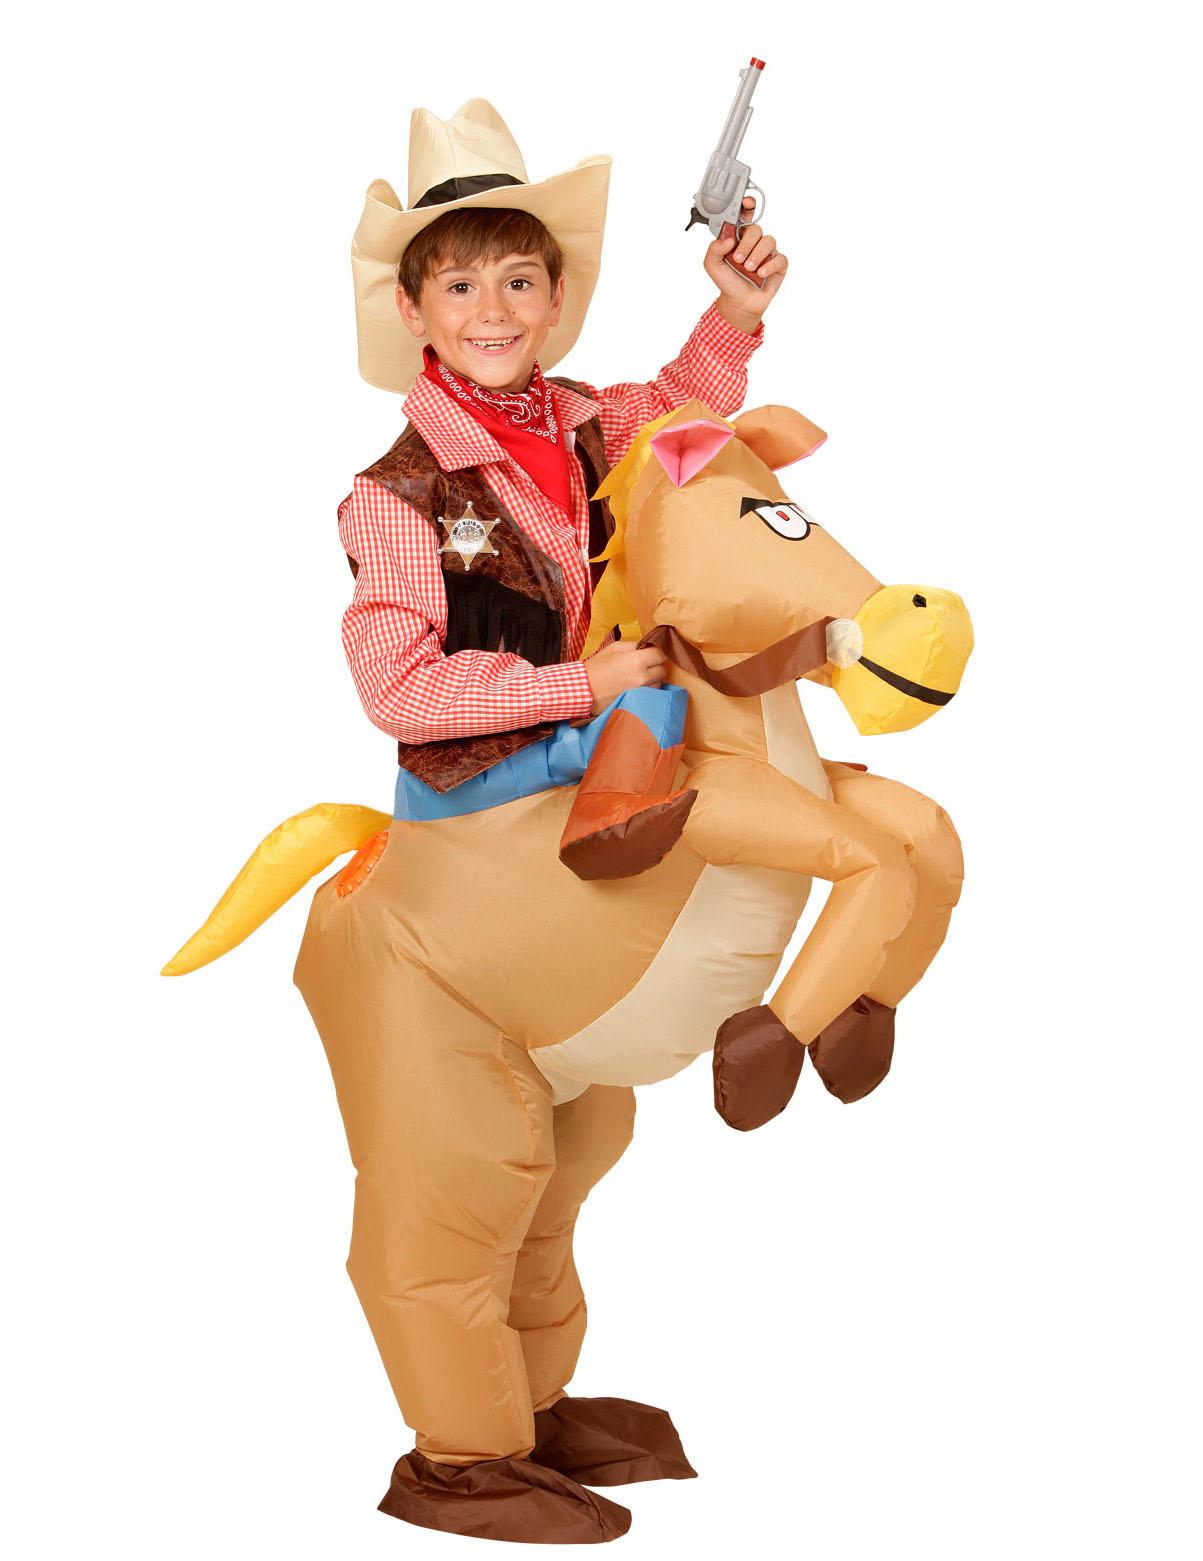 Western Pferd Kostum Aufblasbar Kinder Braun Gunstige Faschings